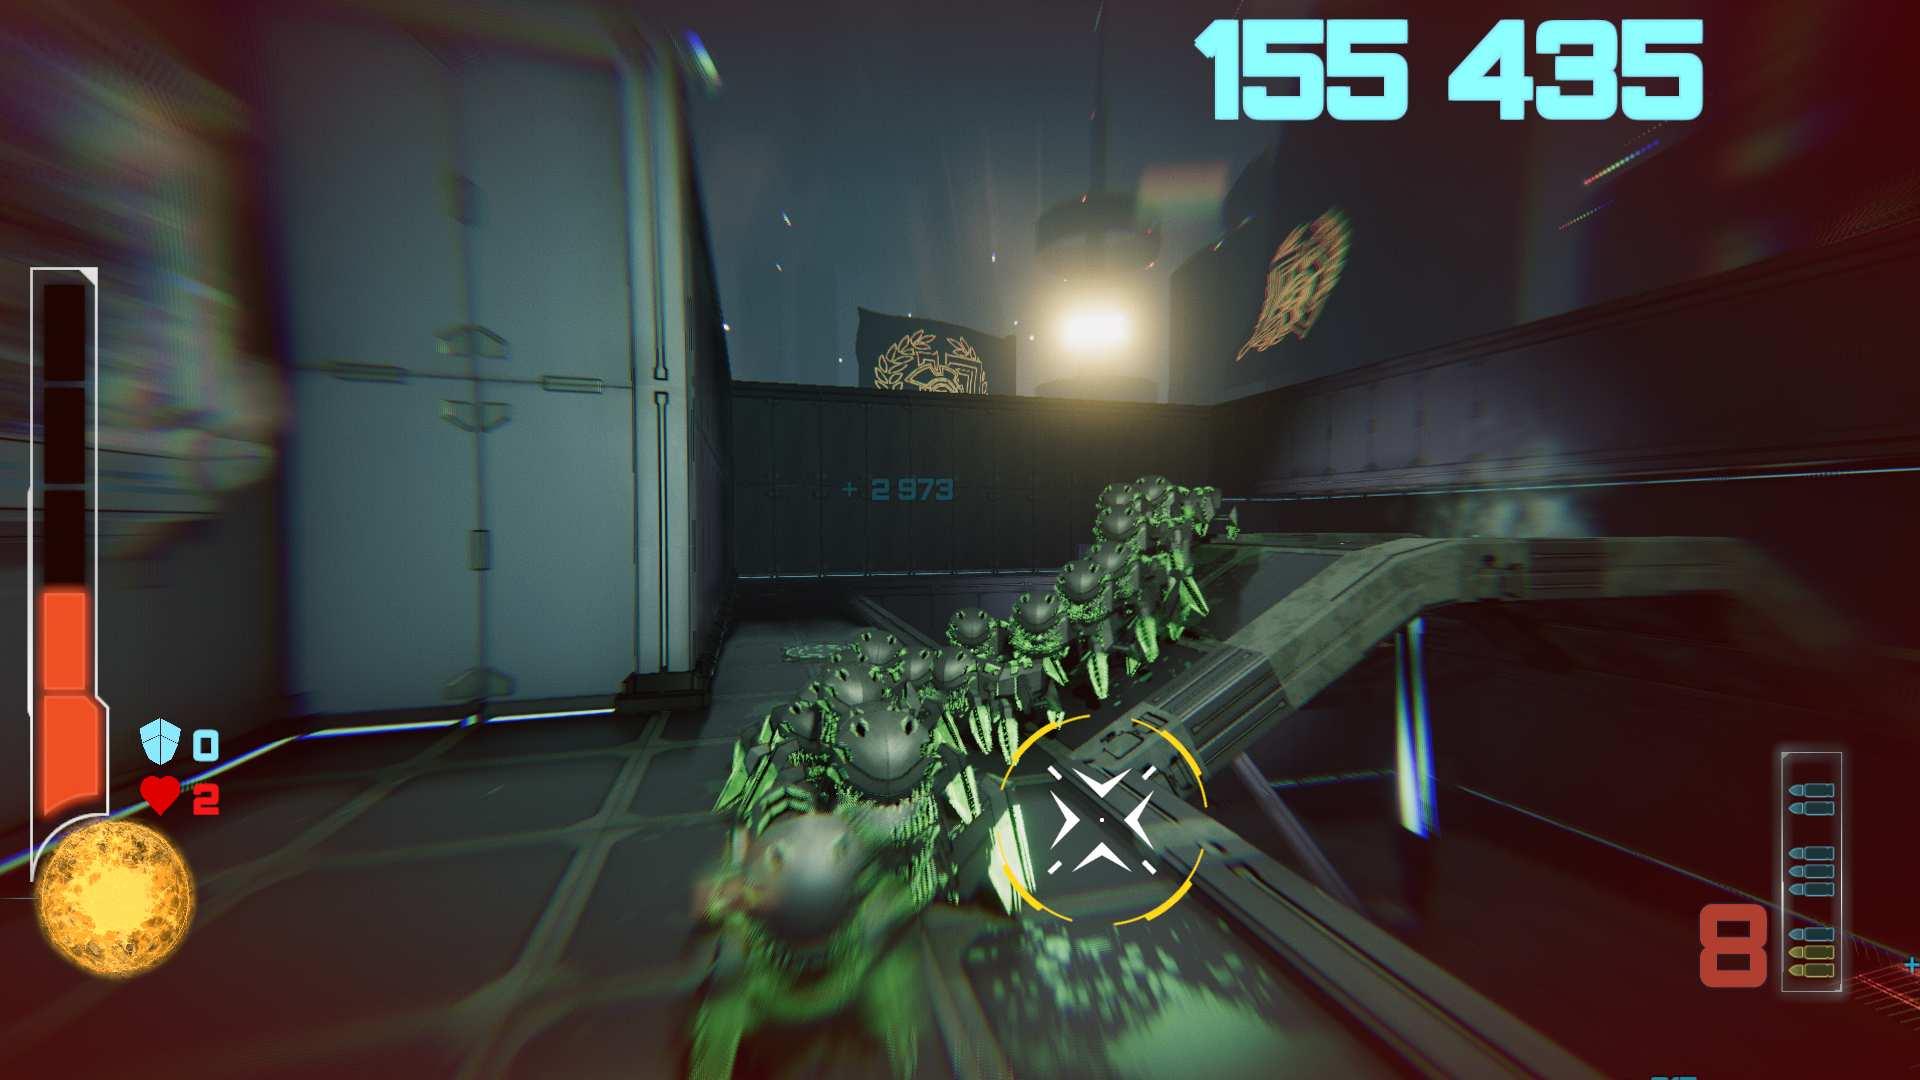 death-live-screen-game-14.jpg